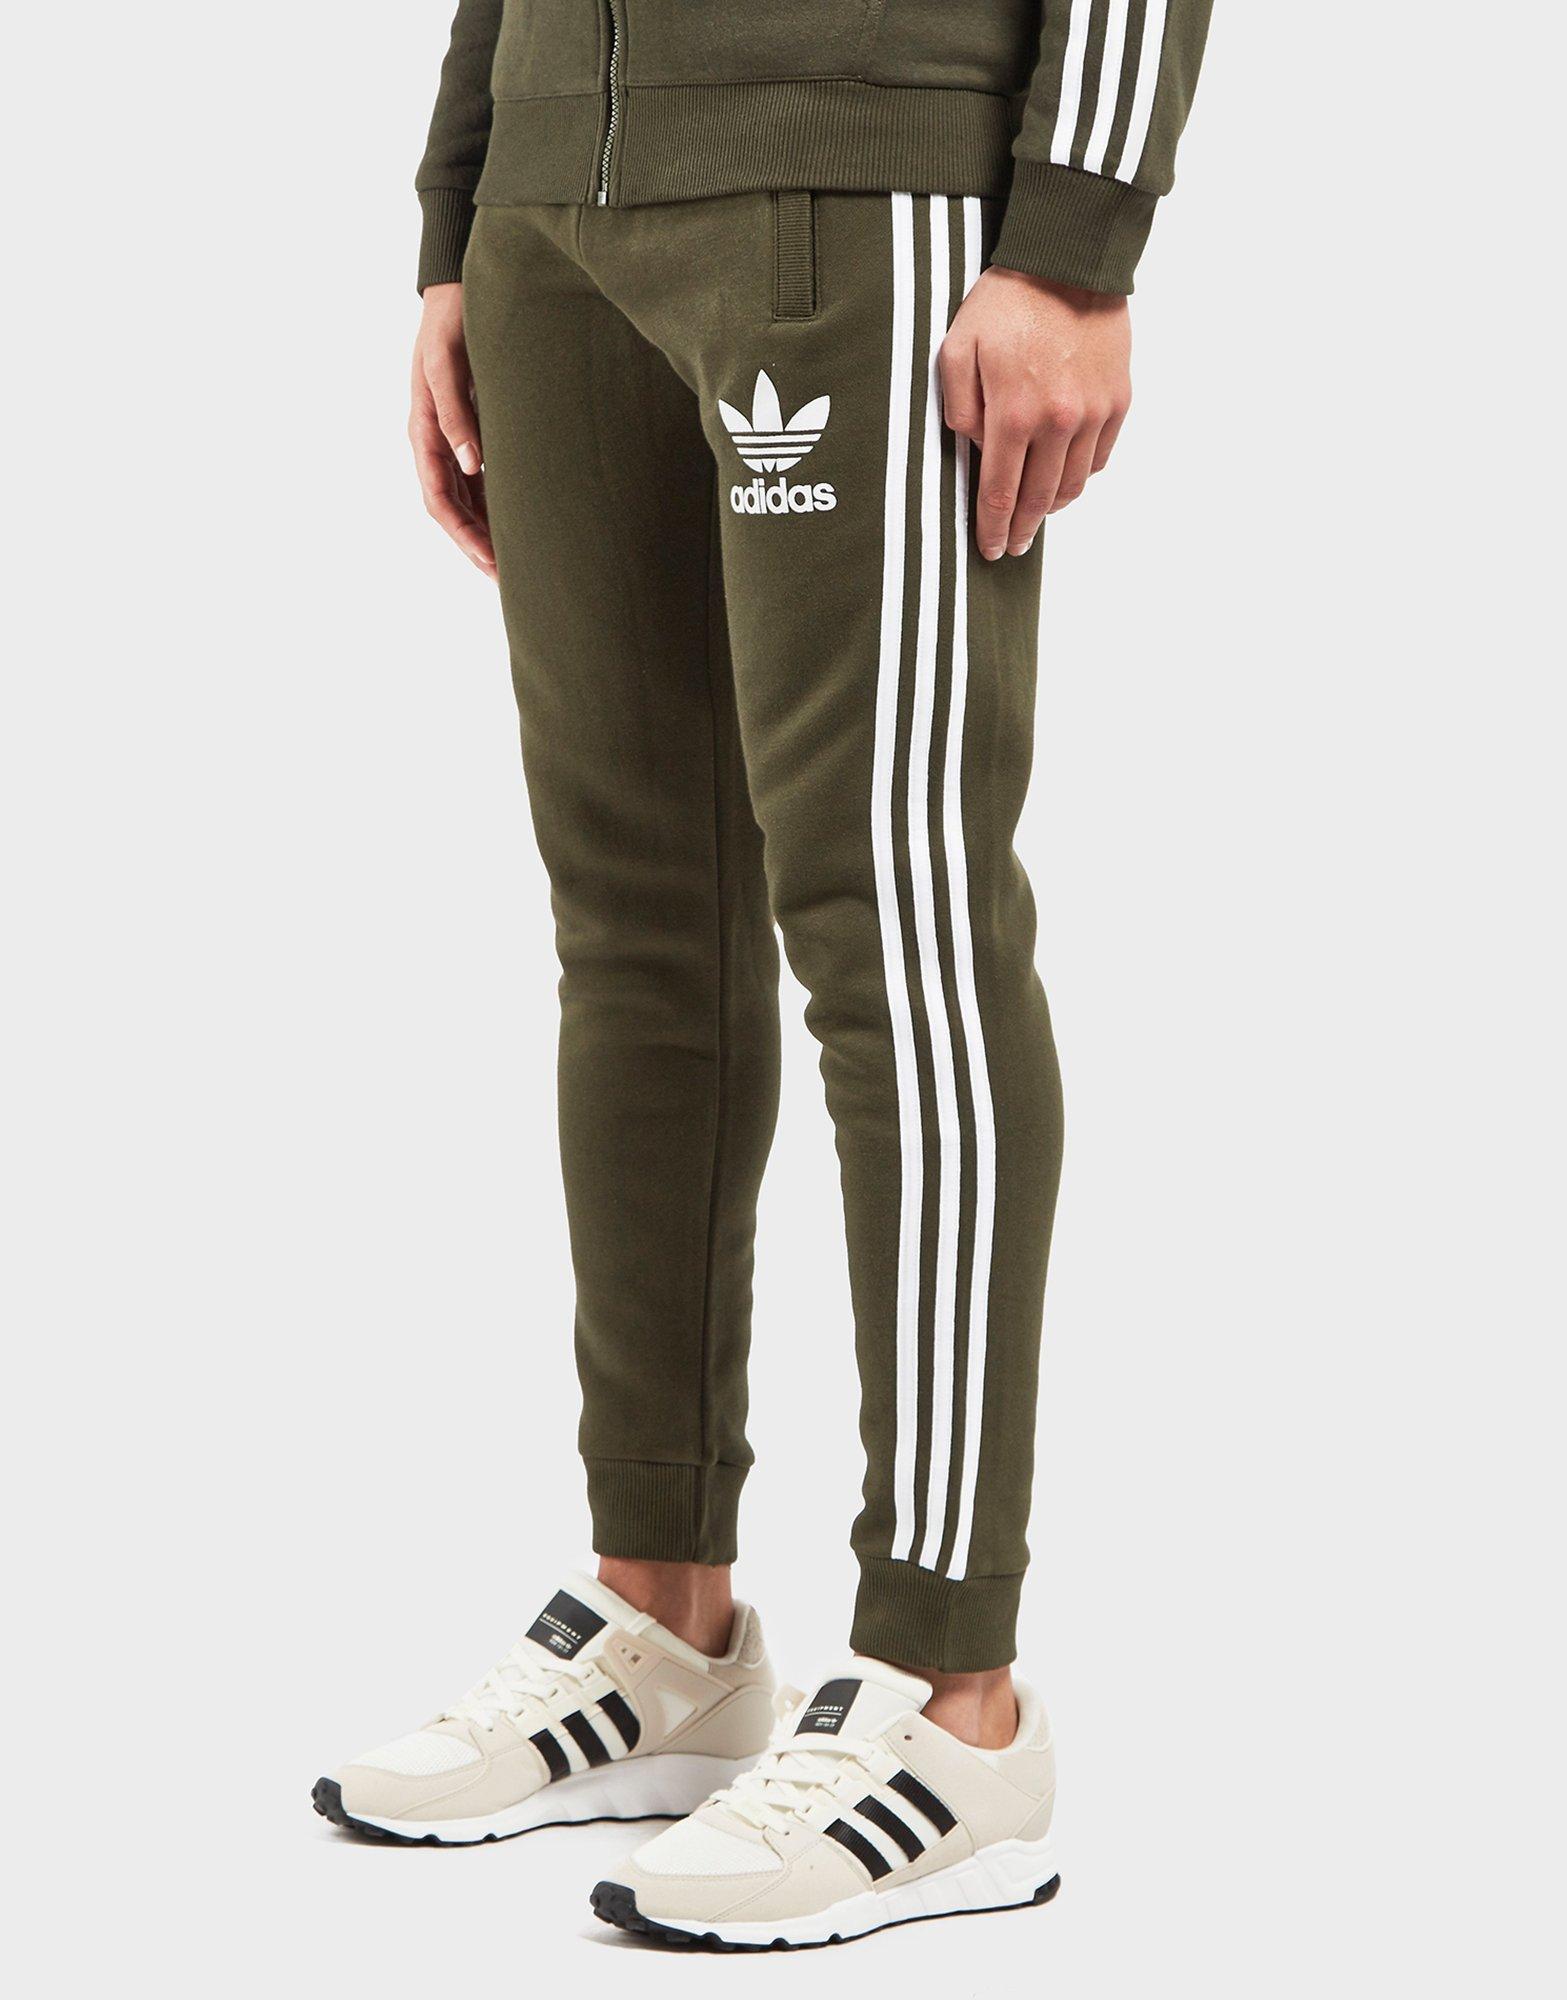 adidas california fleece pants